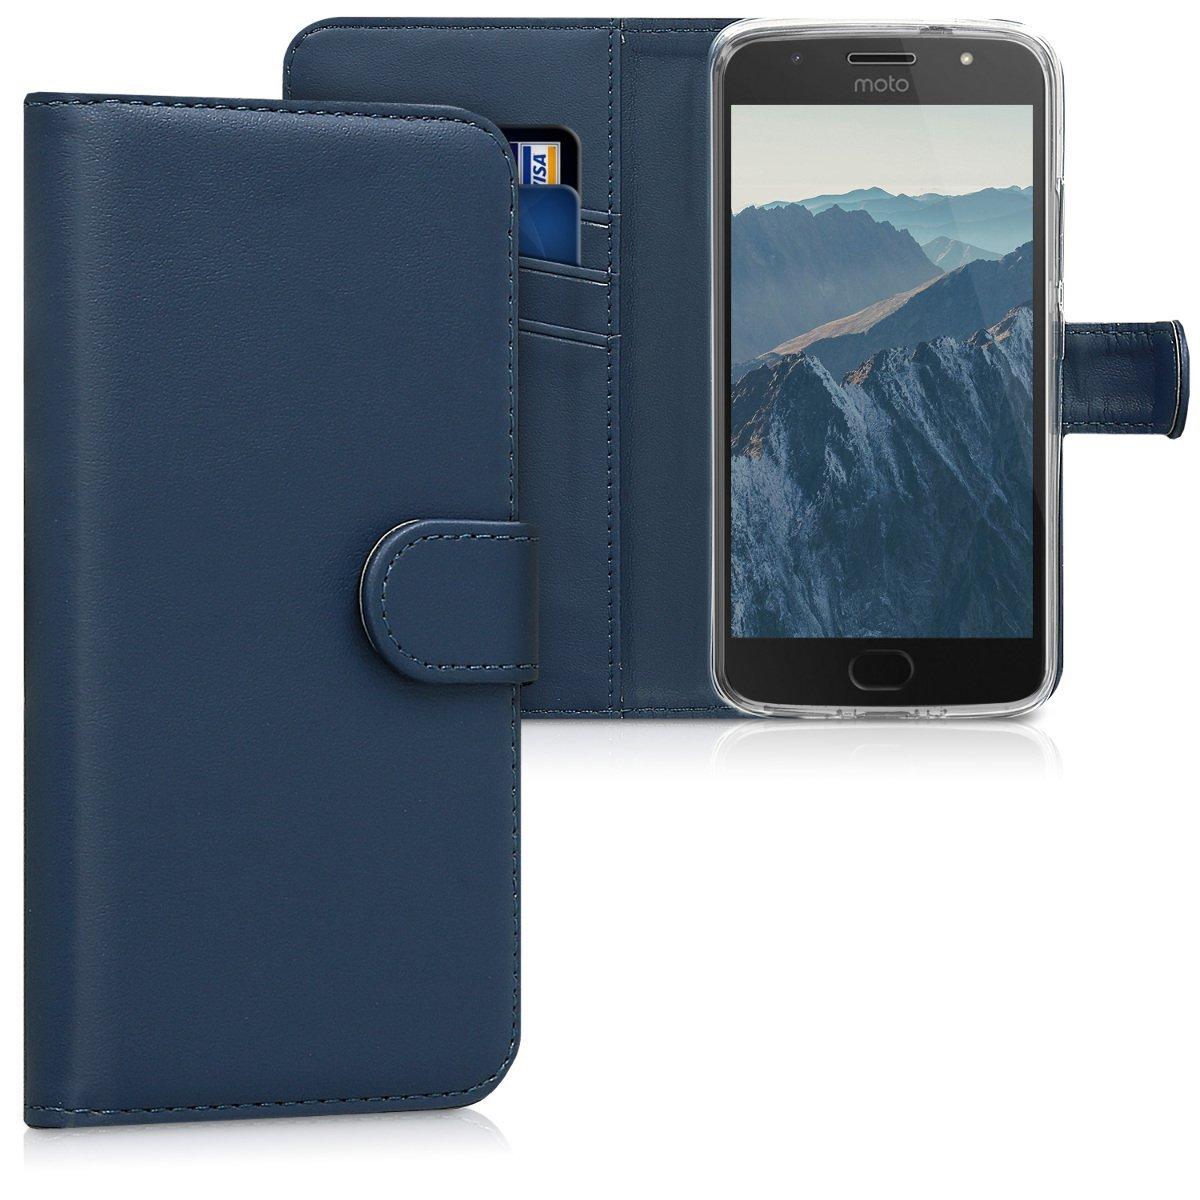 KW Θήκη - Πορτοφόλι Motorola Moto G5S - Dark Blue (42813.17)